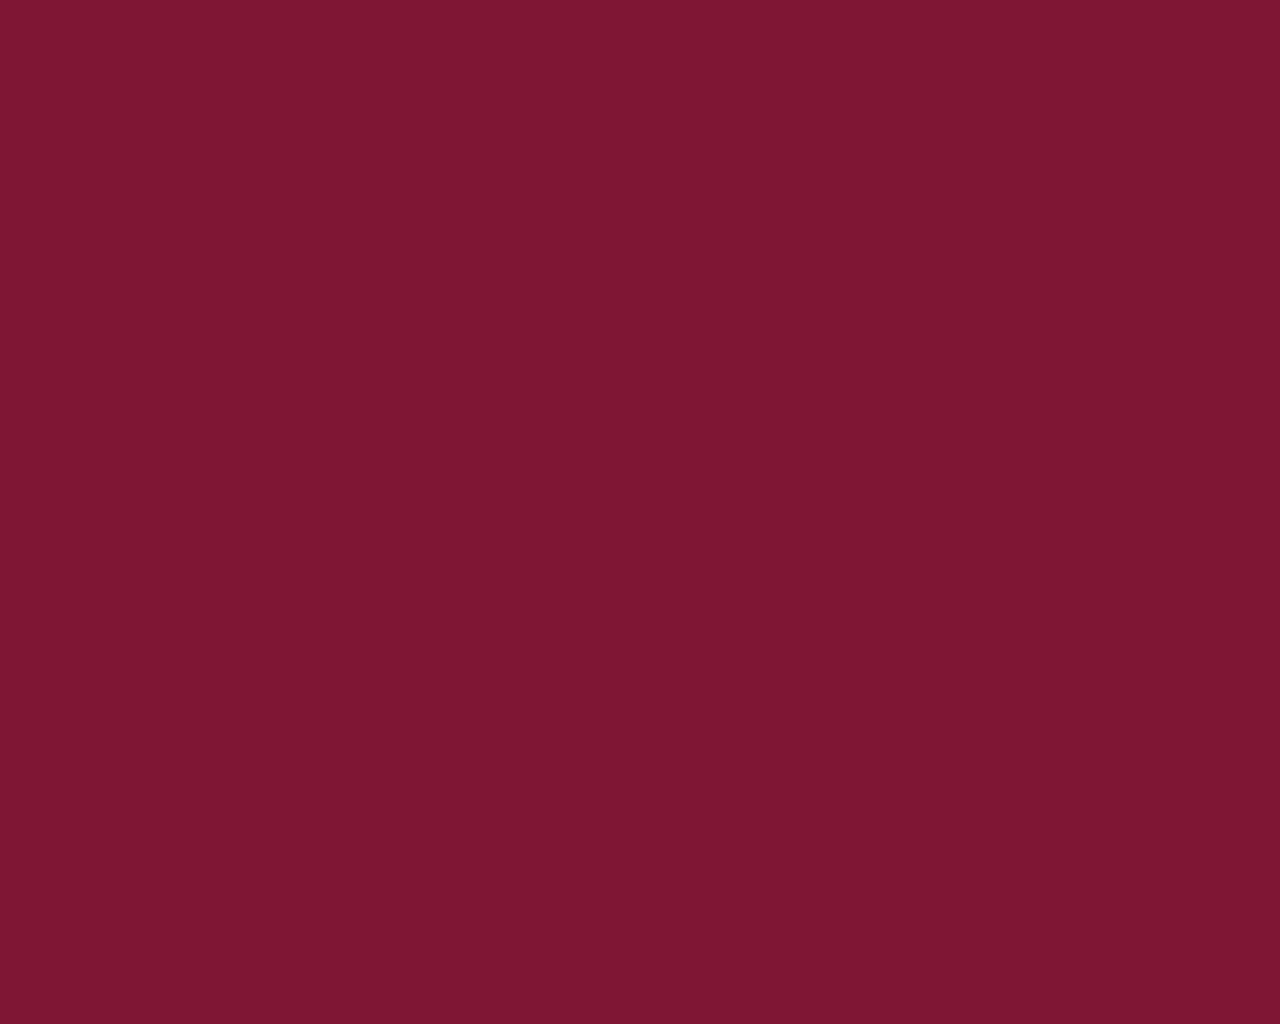 1280x1024 Claret Solid Color Background